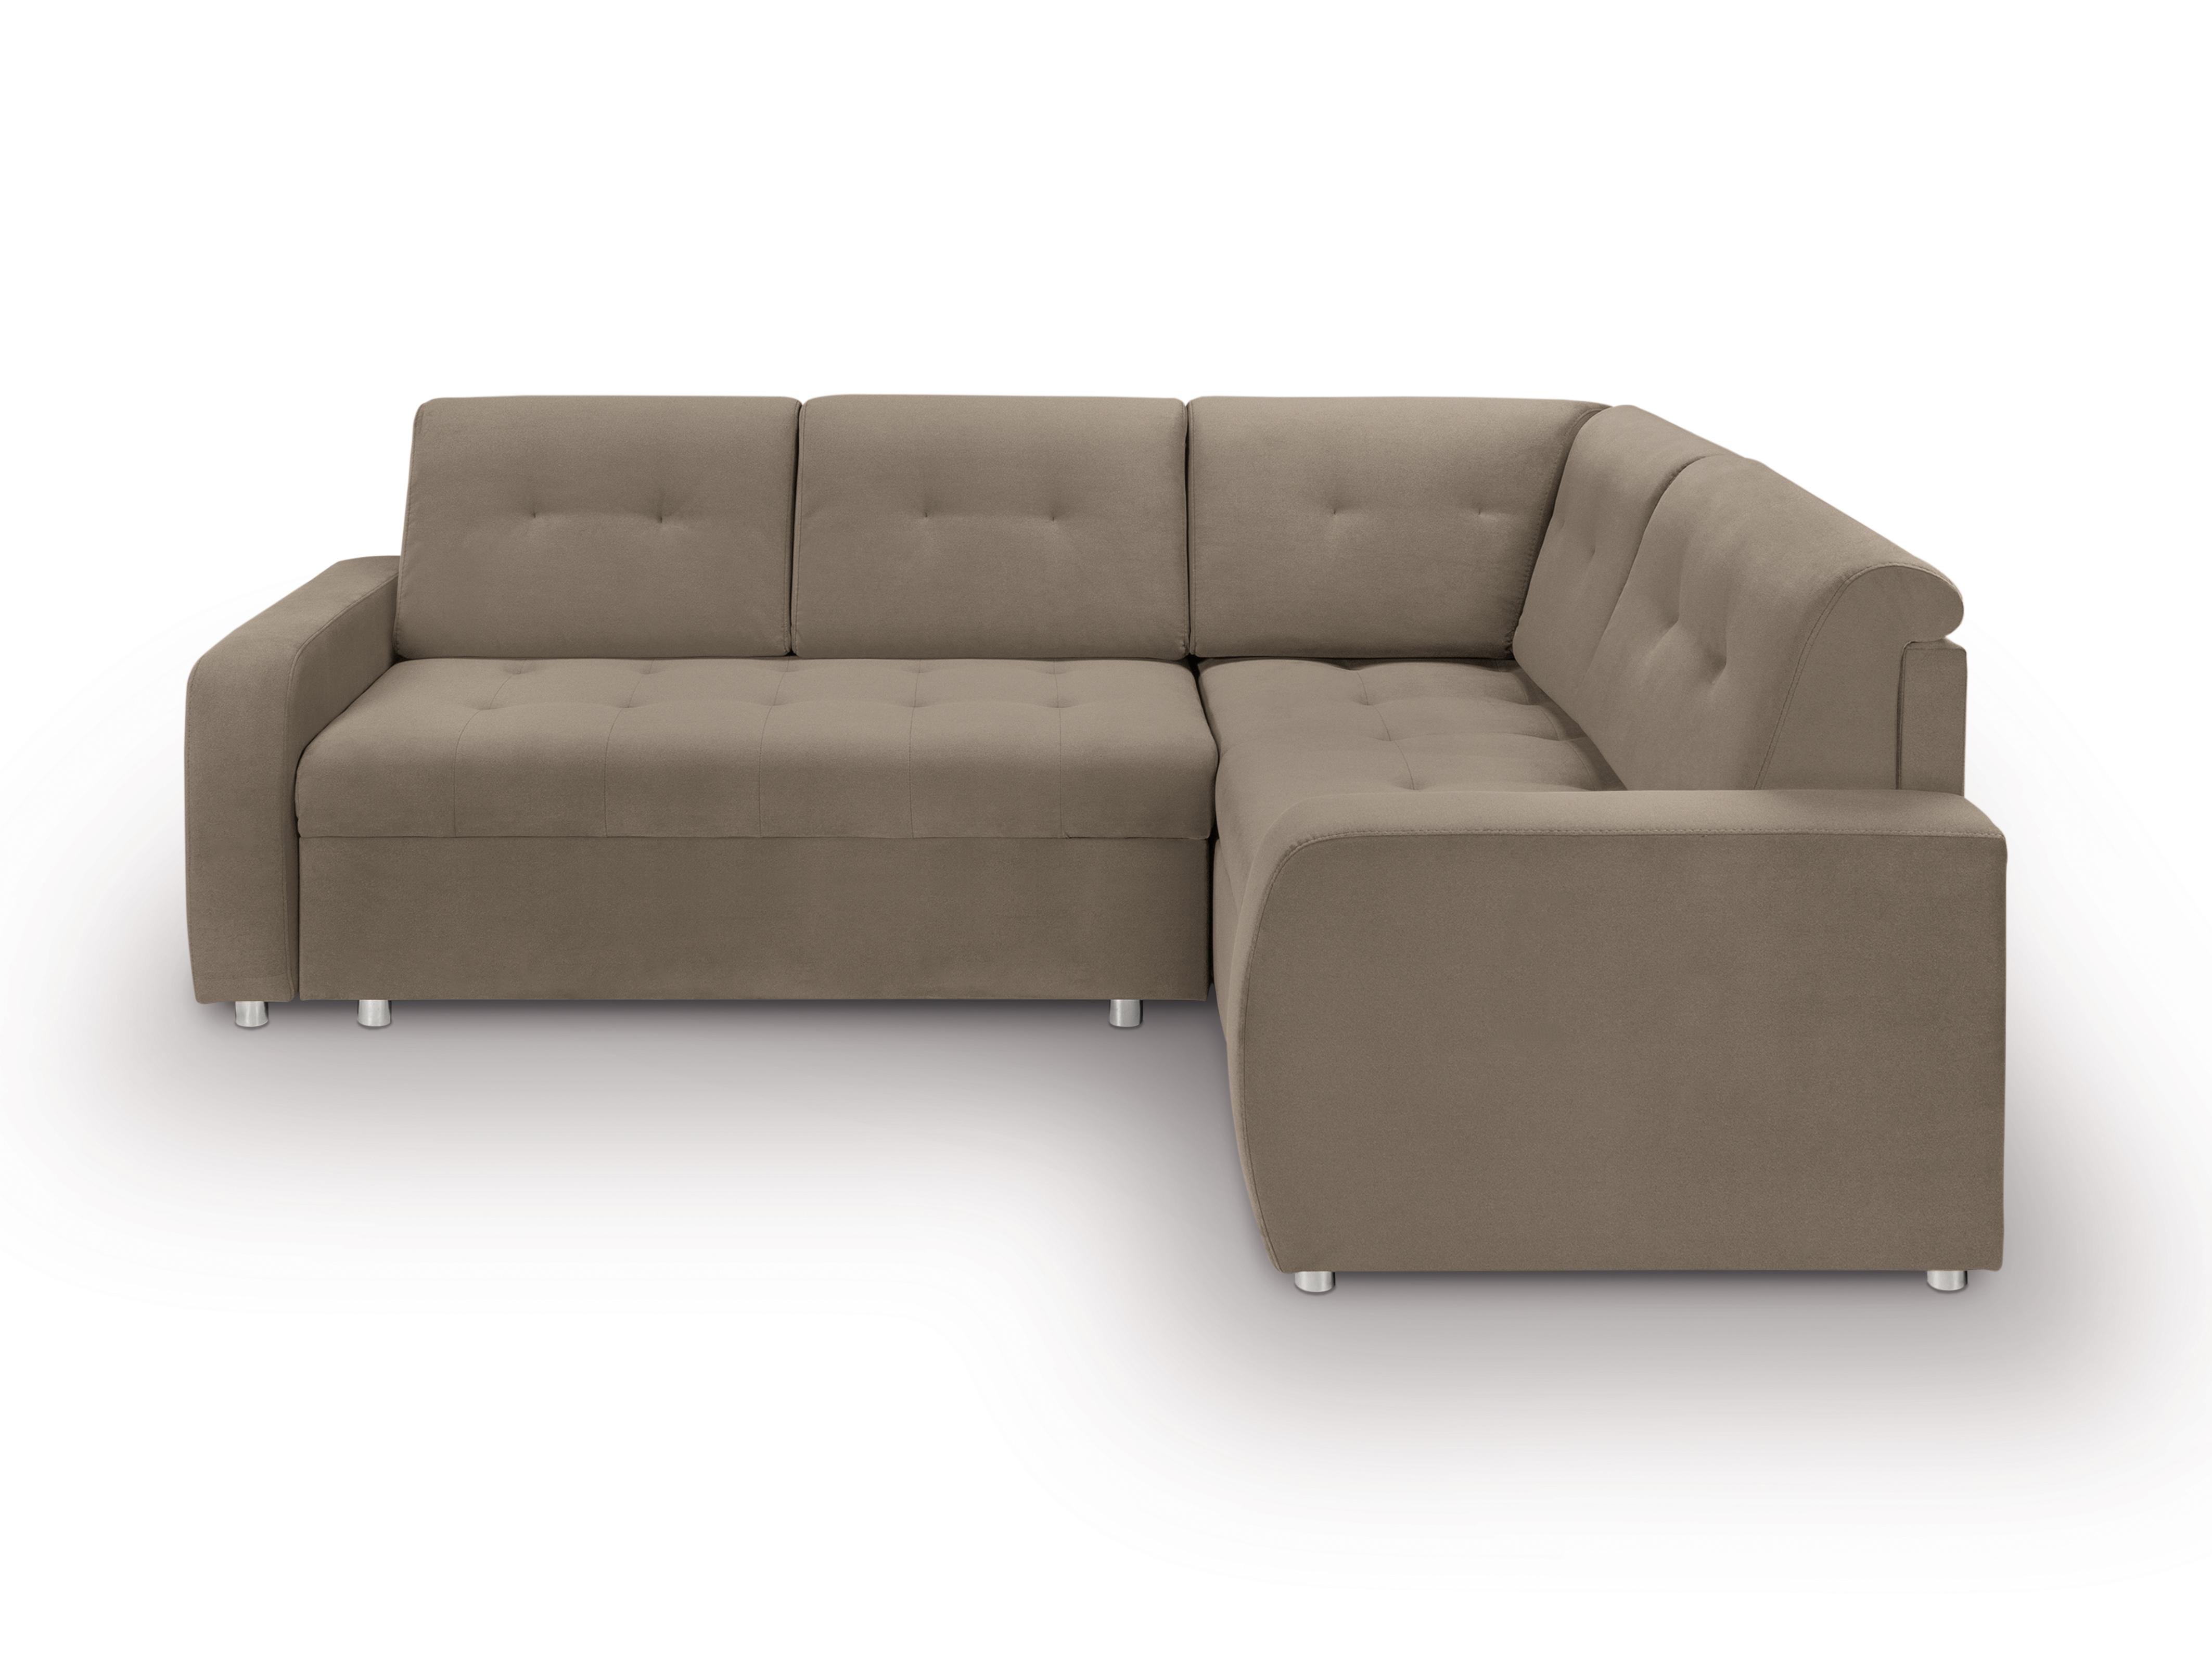 Rohová sedací souprava - BRW - Willy Lux 3DL RECBKMU (hnědá) (P)